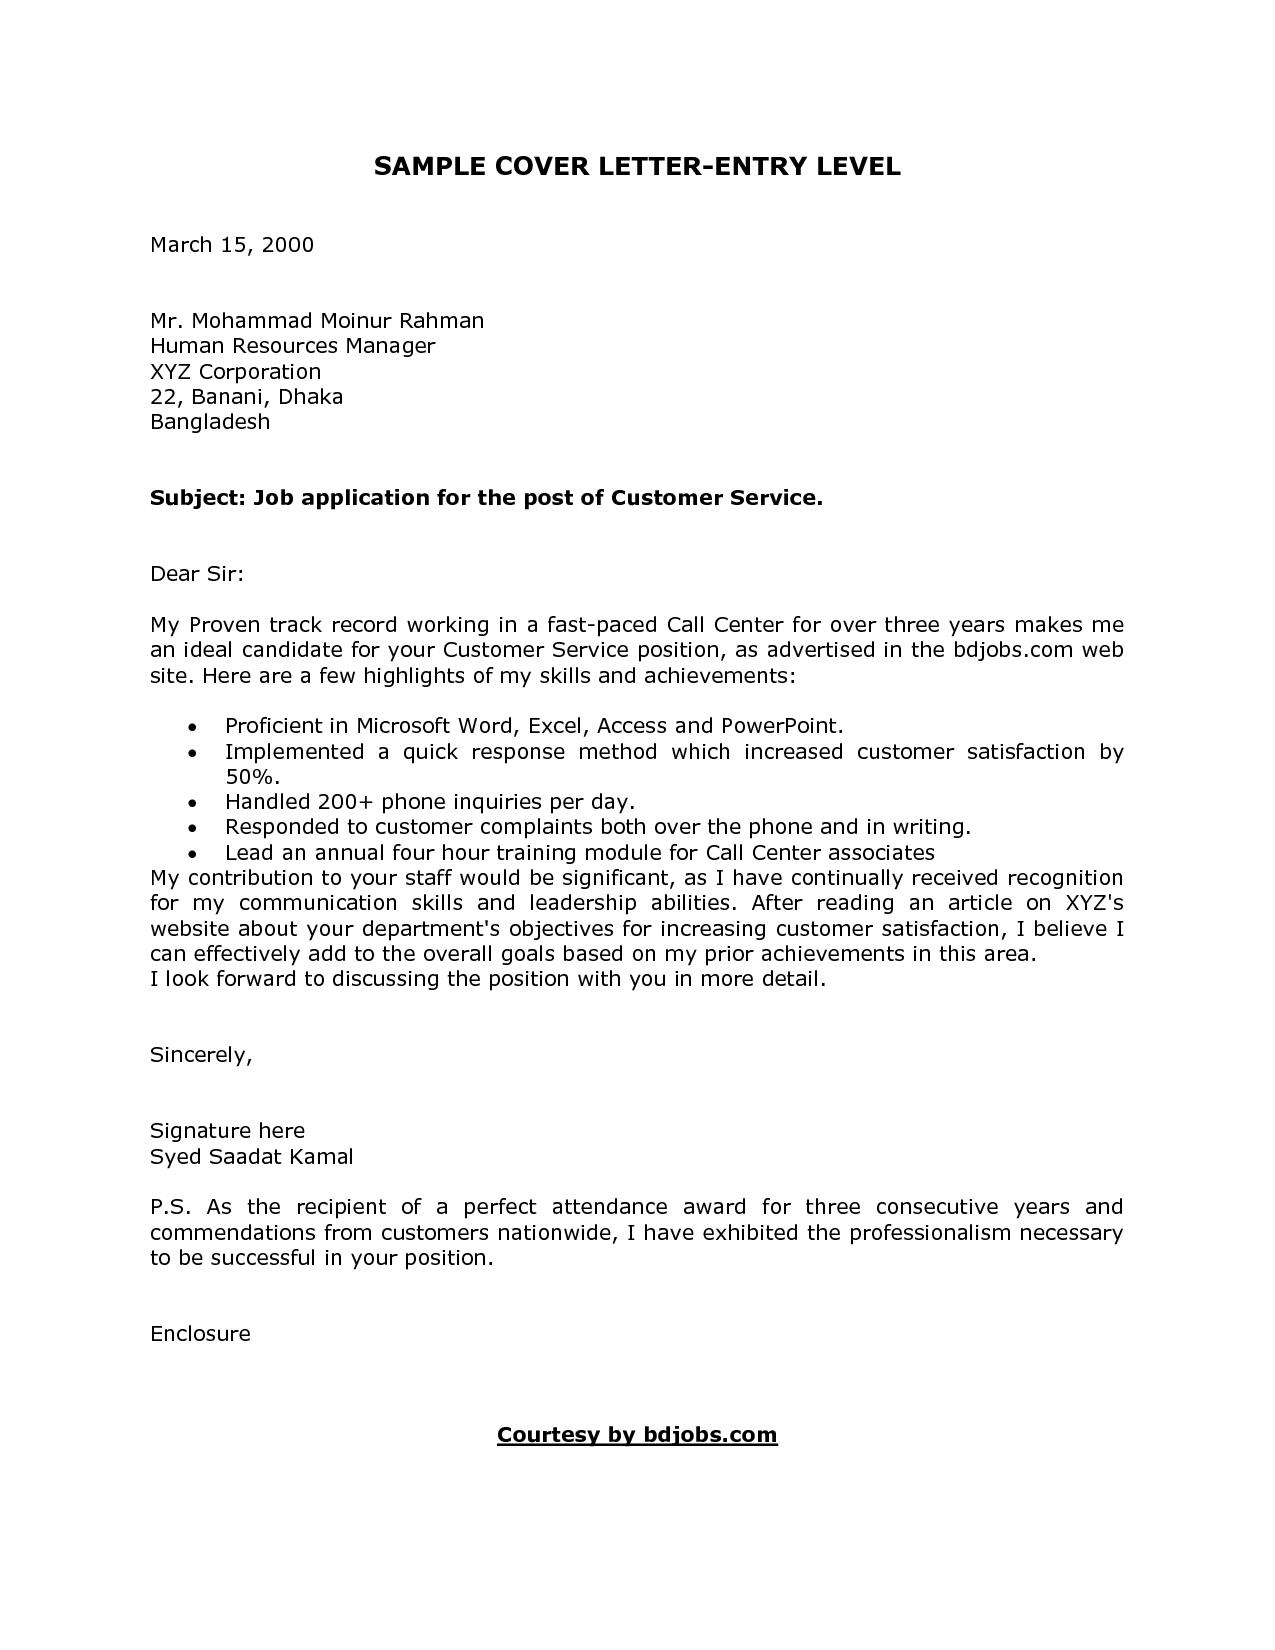 Formal cover letter sample for entry level job resume writing formal cover letter sample for entry level job resume writing example alexa spiritdancerdesigns Choice Image